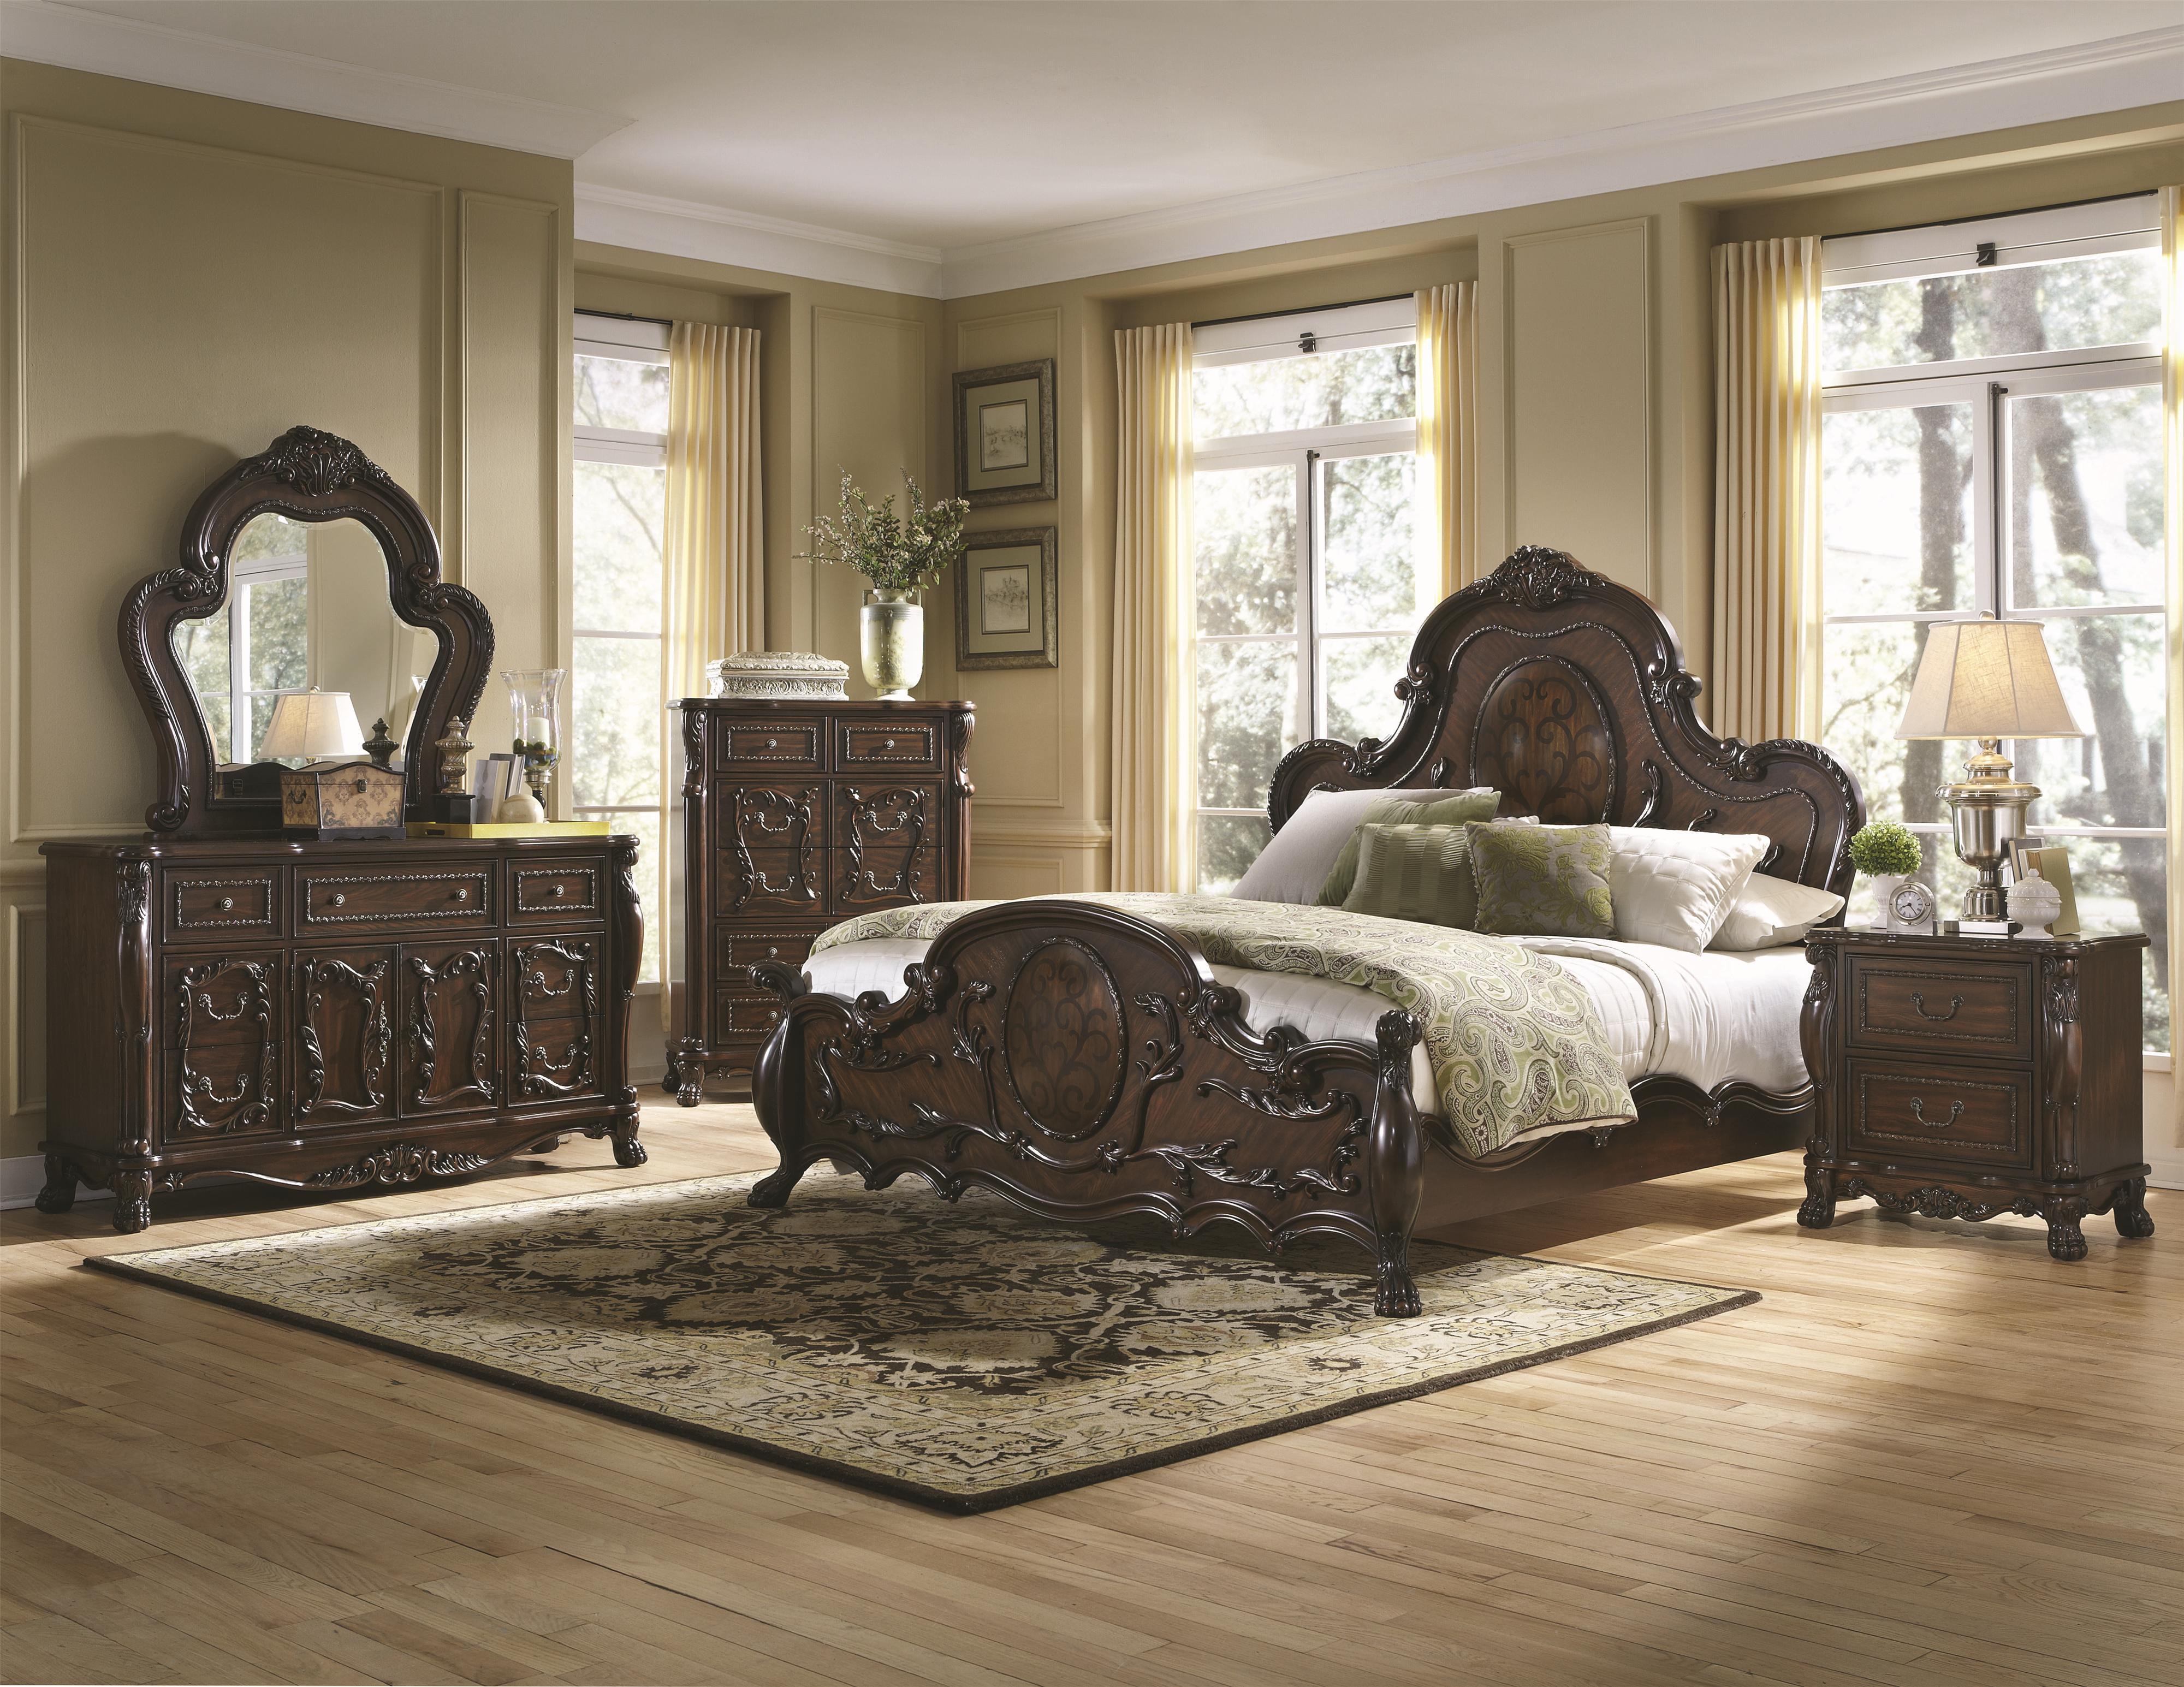 Coaster Abigail King Bedroom Group 1 - Item Number: 20445 K Bedroom Group 1